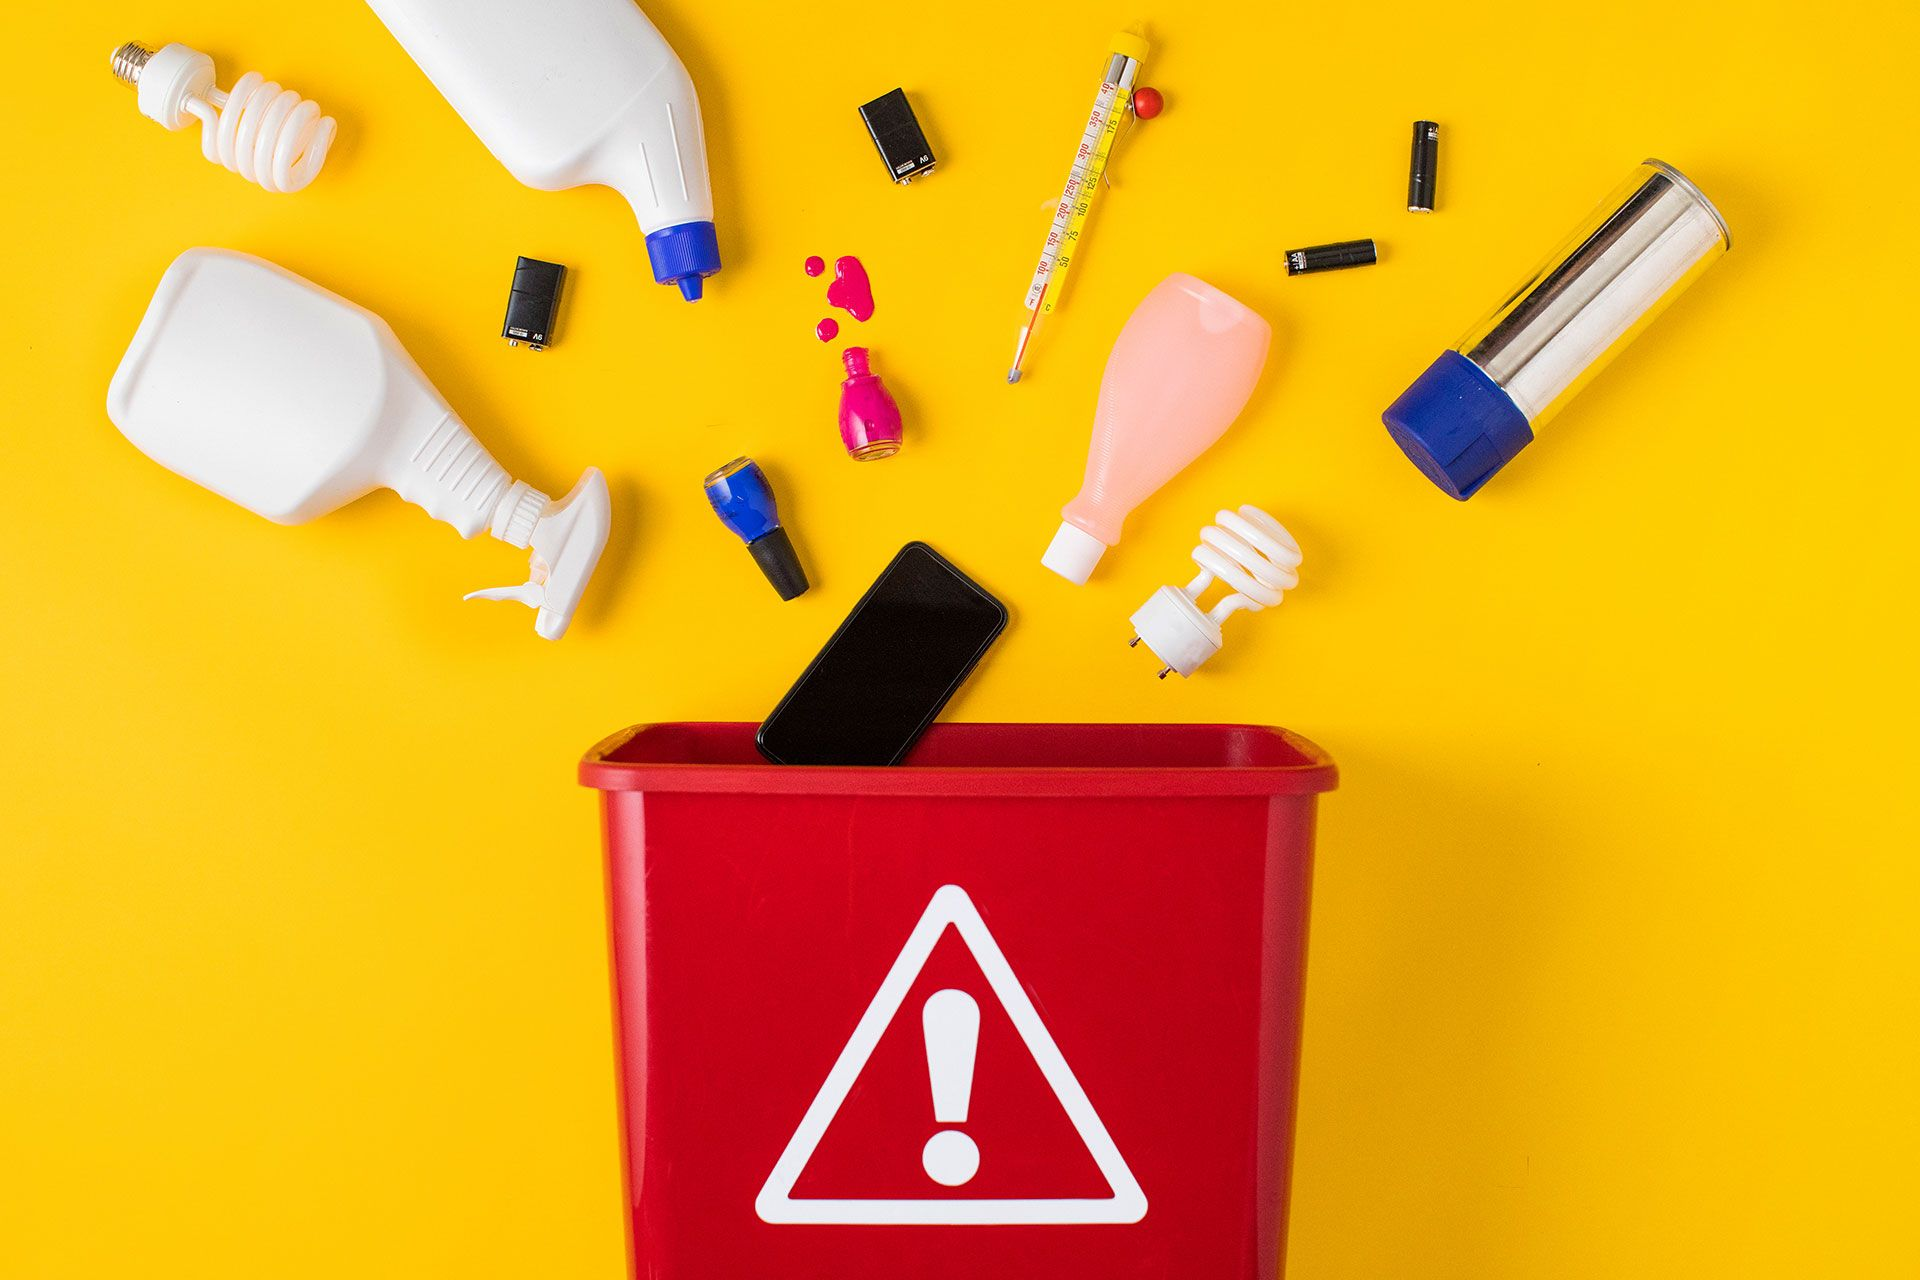 How to dispose of household hazardous waste safely